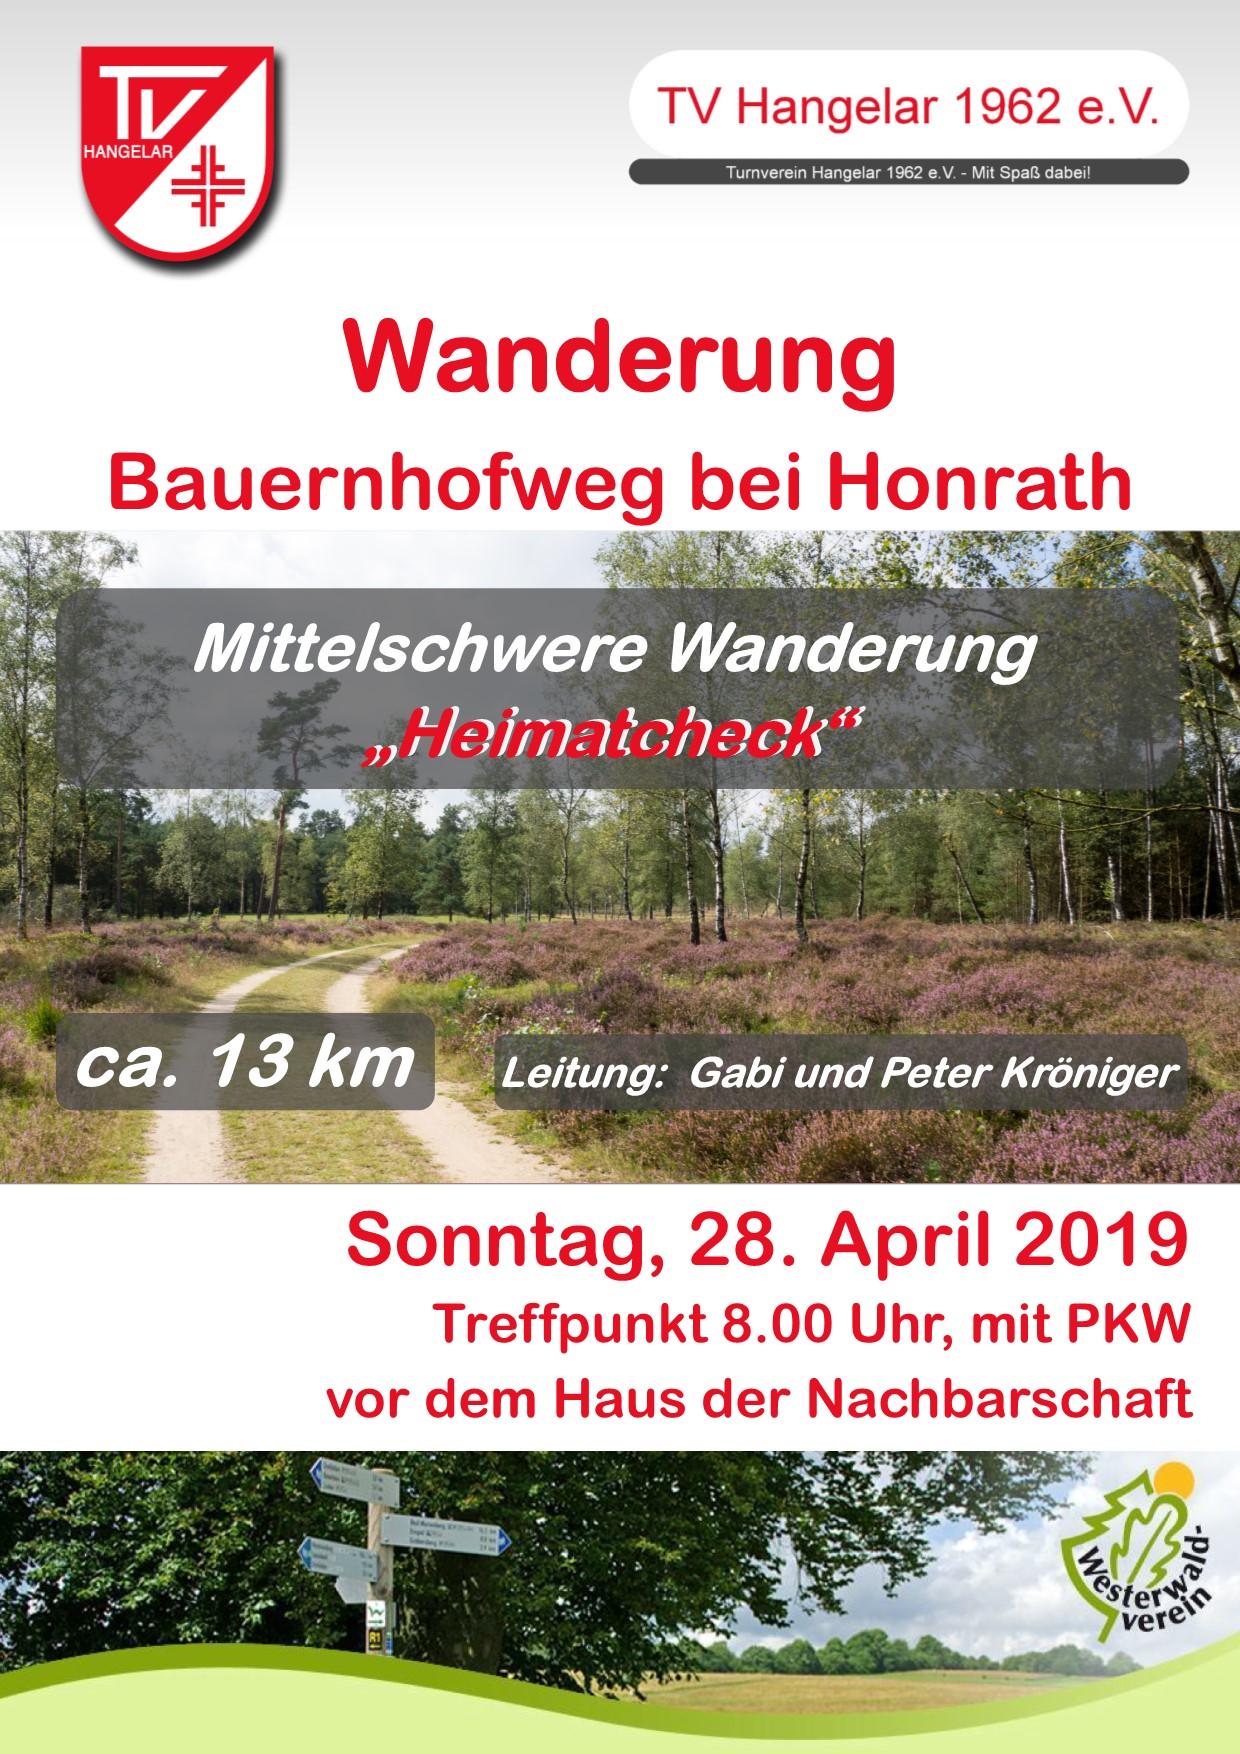 Wanderung 28. April 2019 Honrath